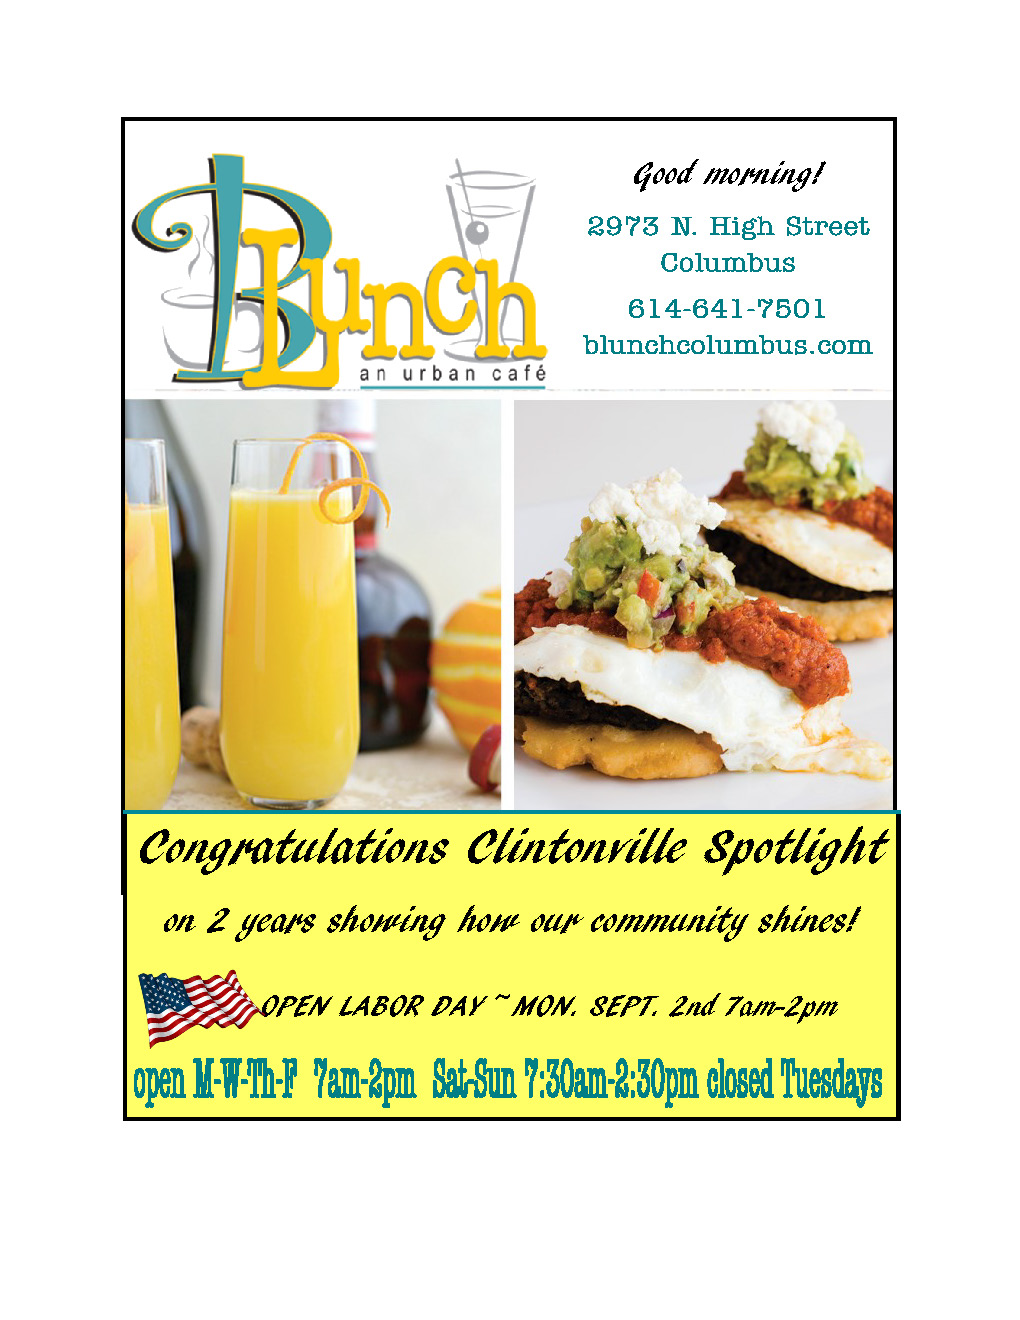 Clintonville Spotlight | Clintonville, OH Local News